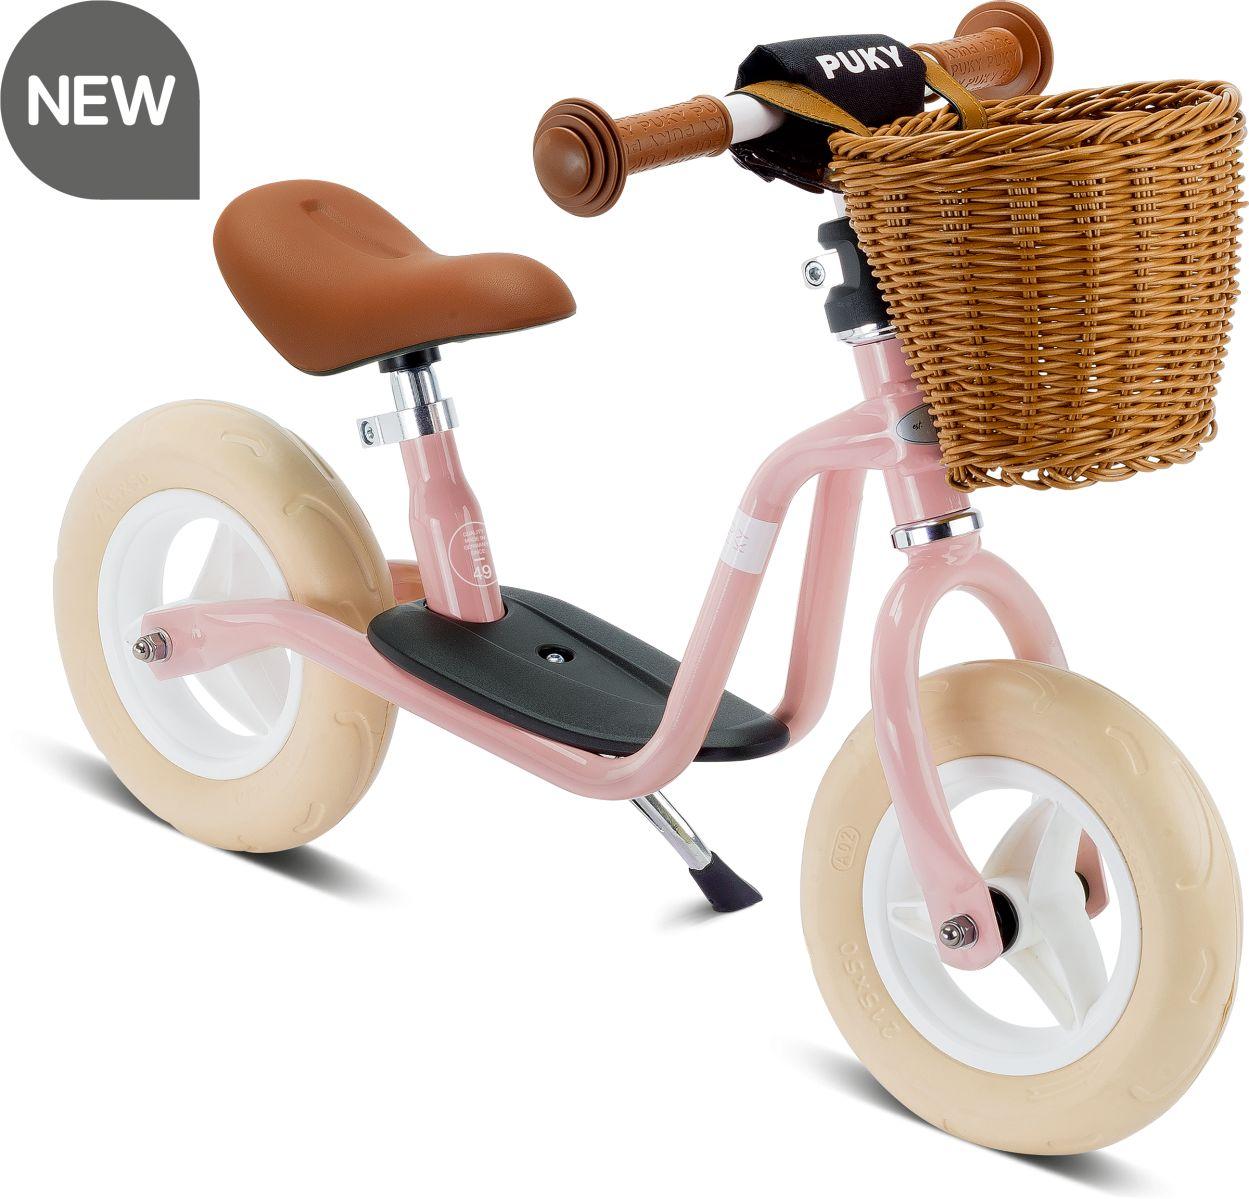 Puky LRM Rowerek biegowy retro pink 4094